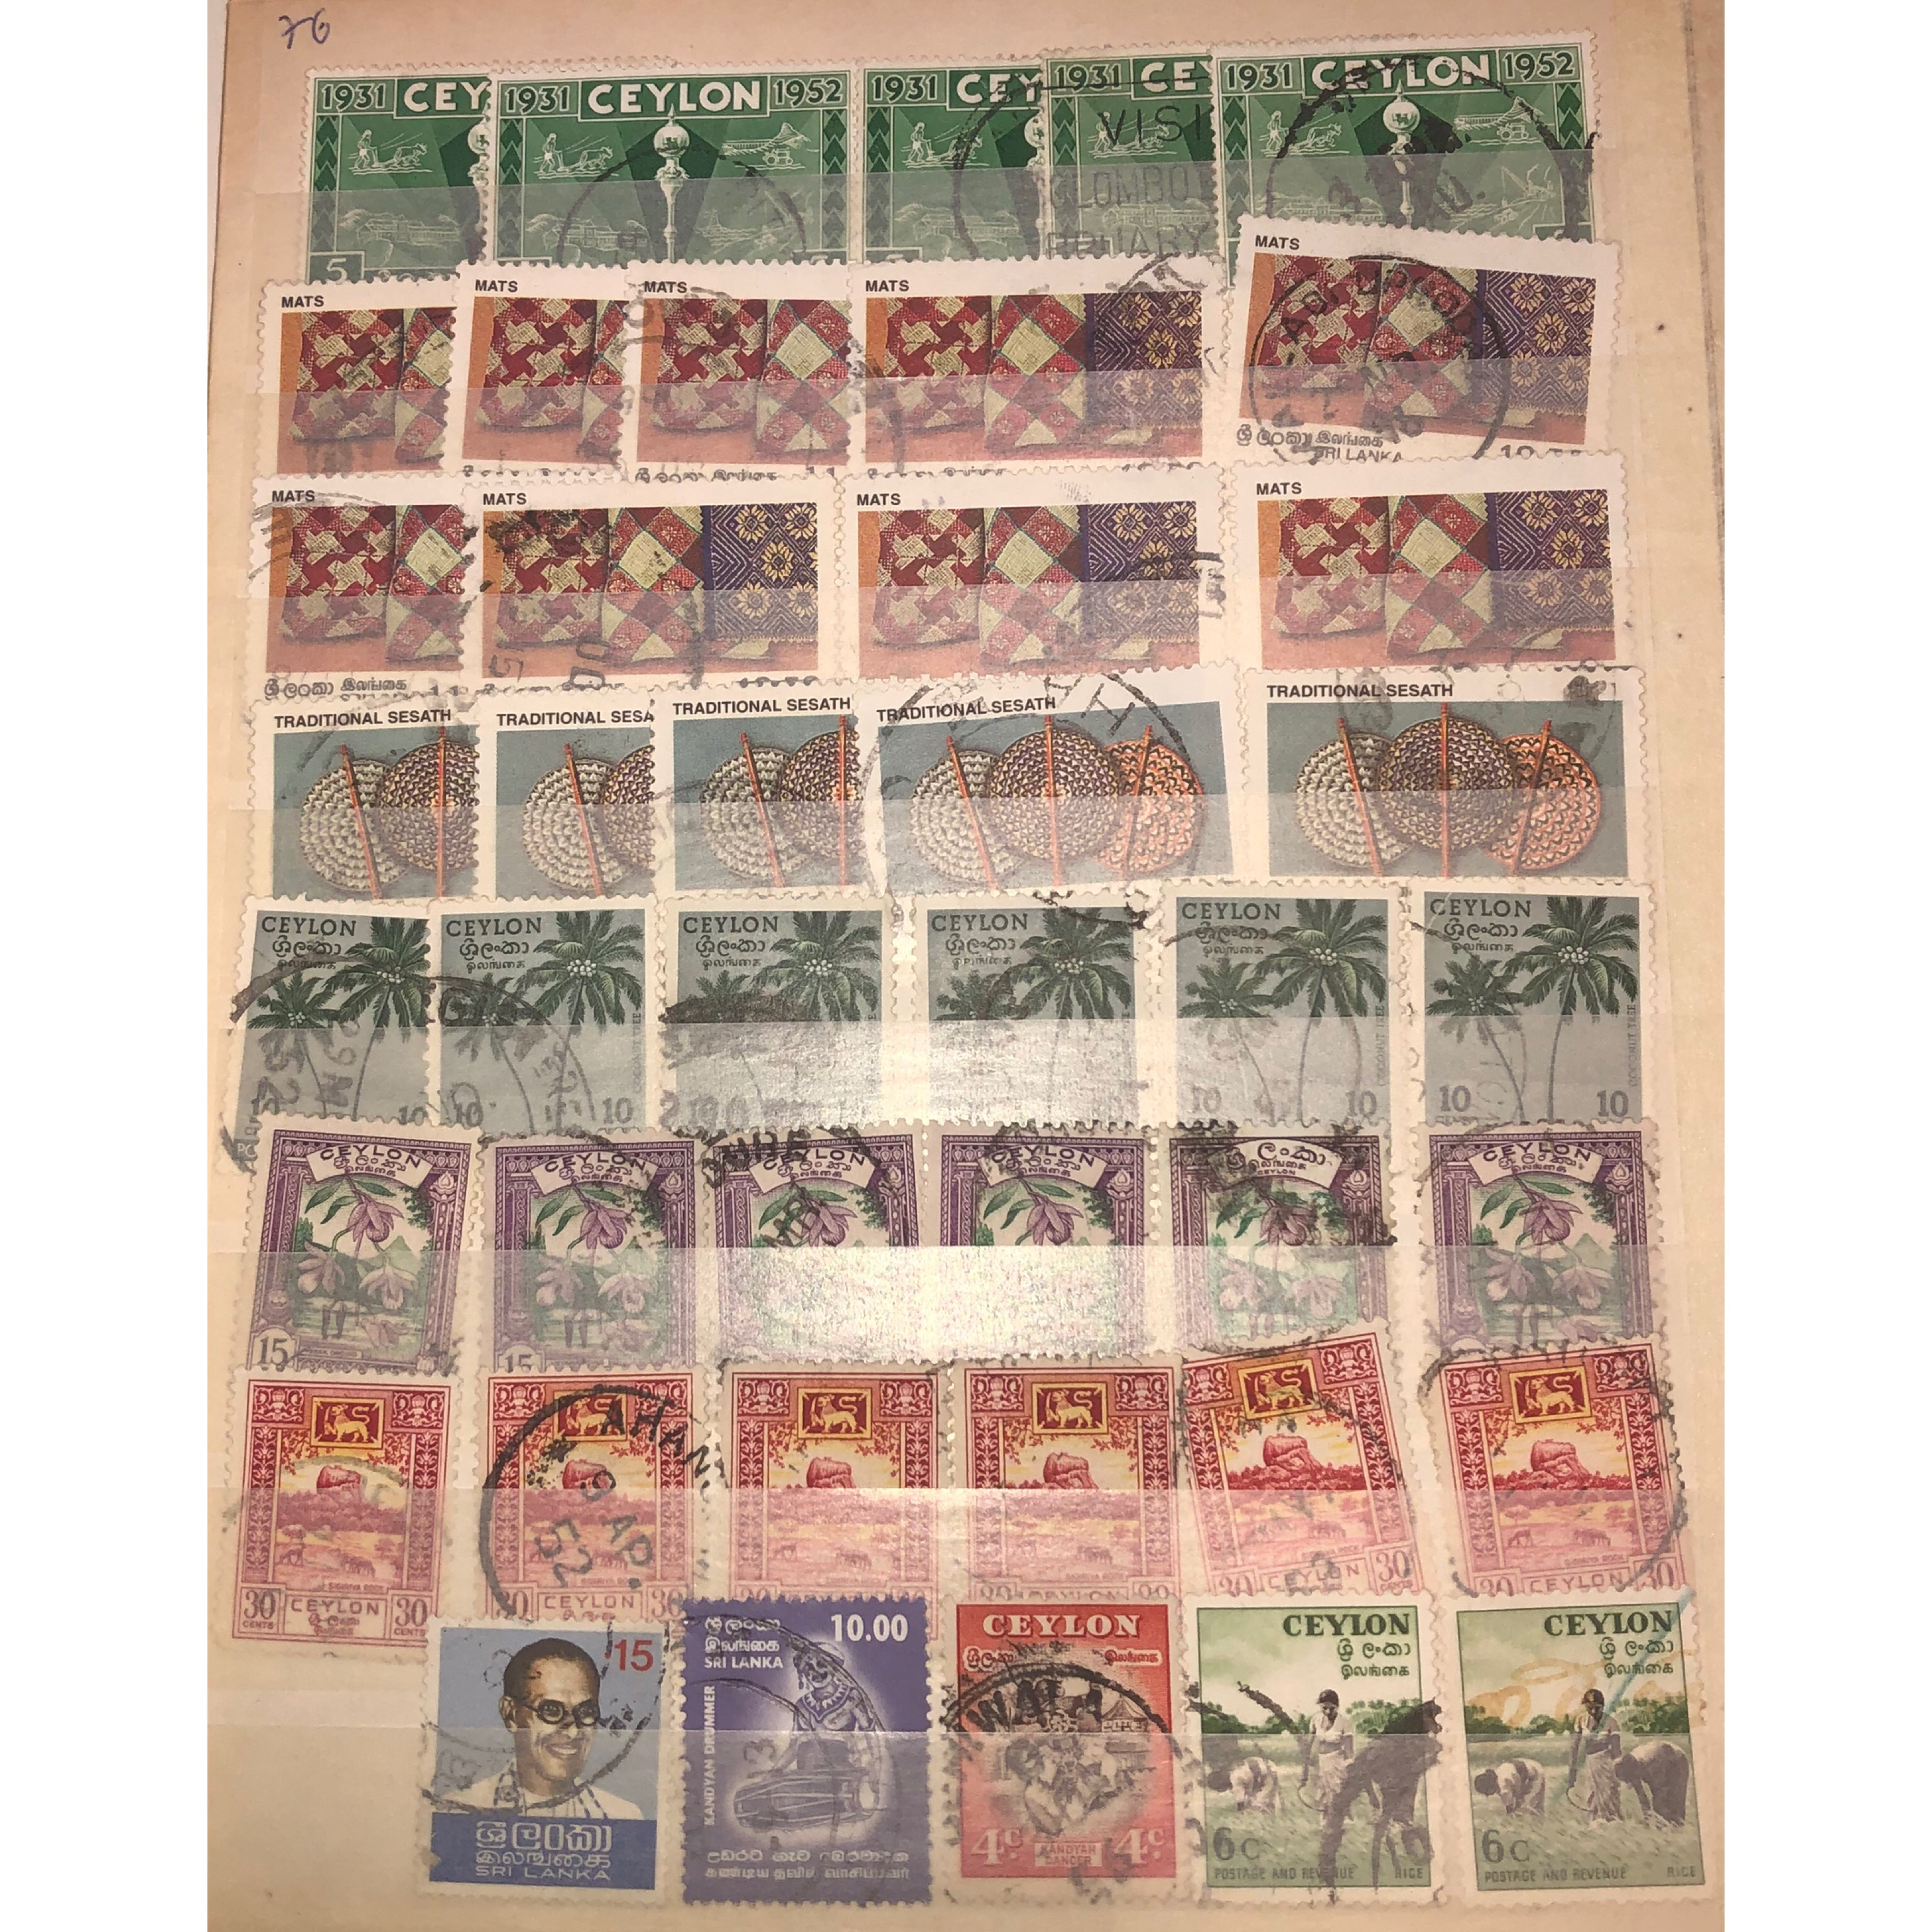 SRI-Lanka stamp album